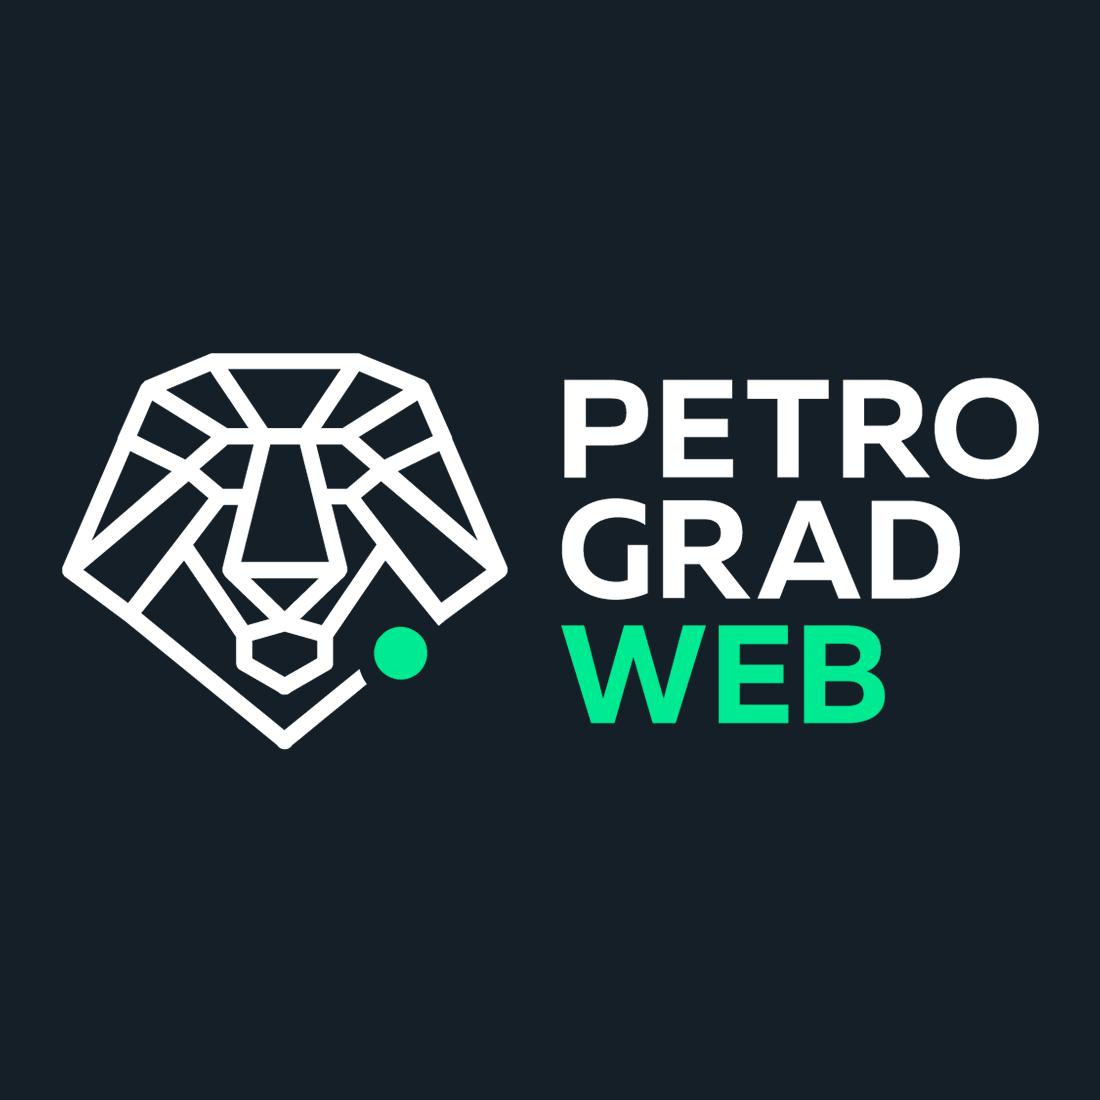 PetrogradWeb